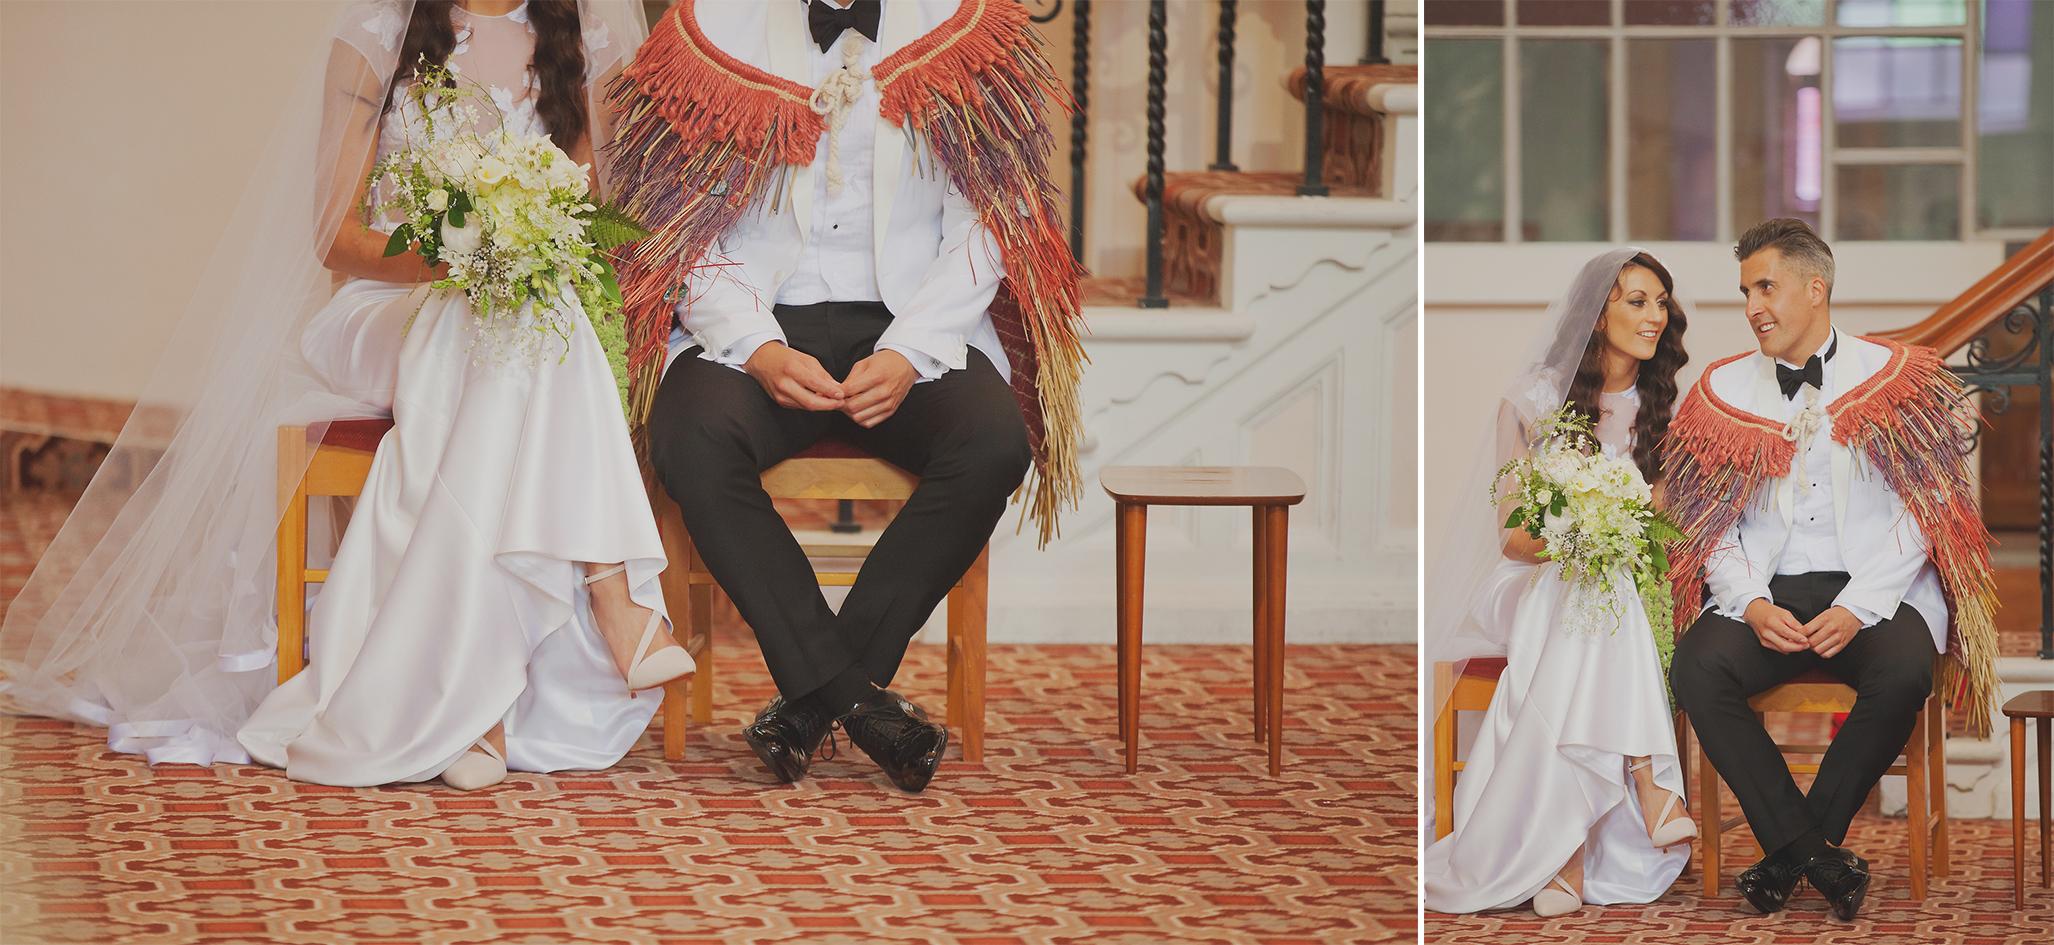 wellington wedding photography NZ - 1209.JPG